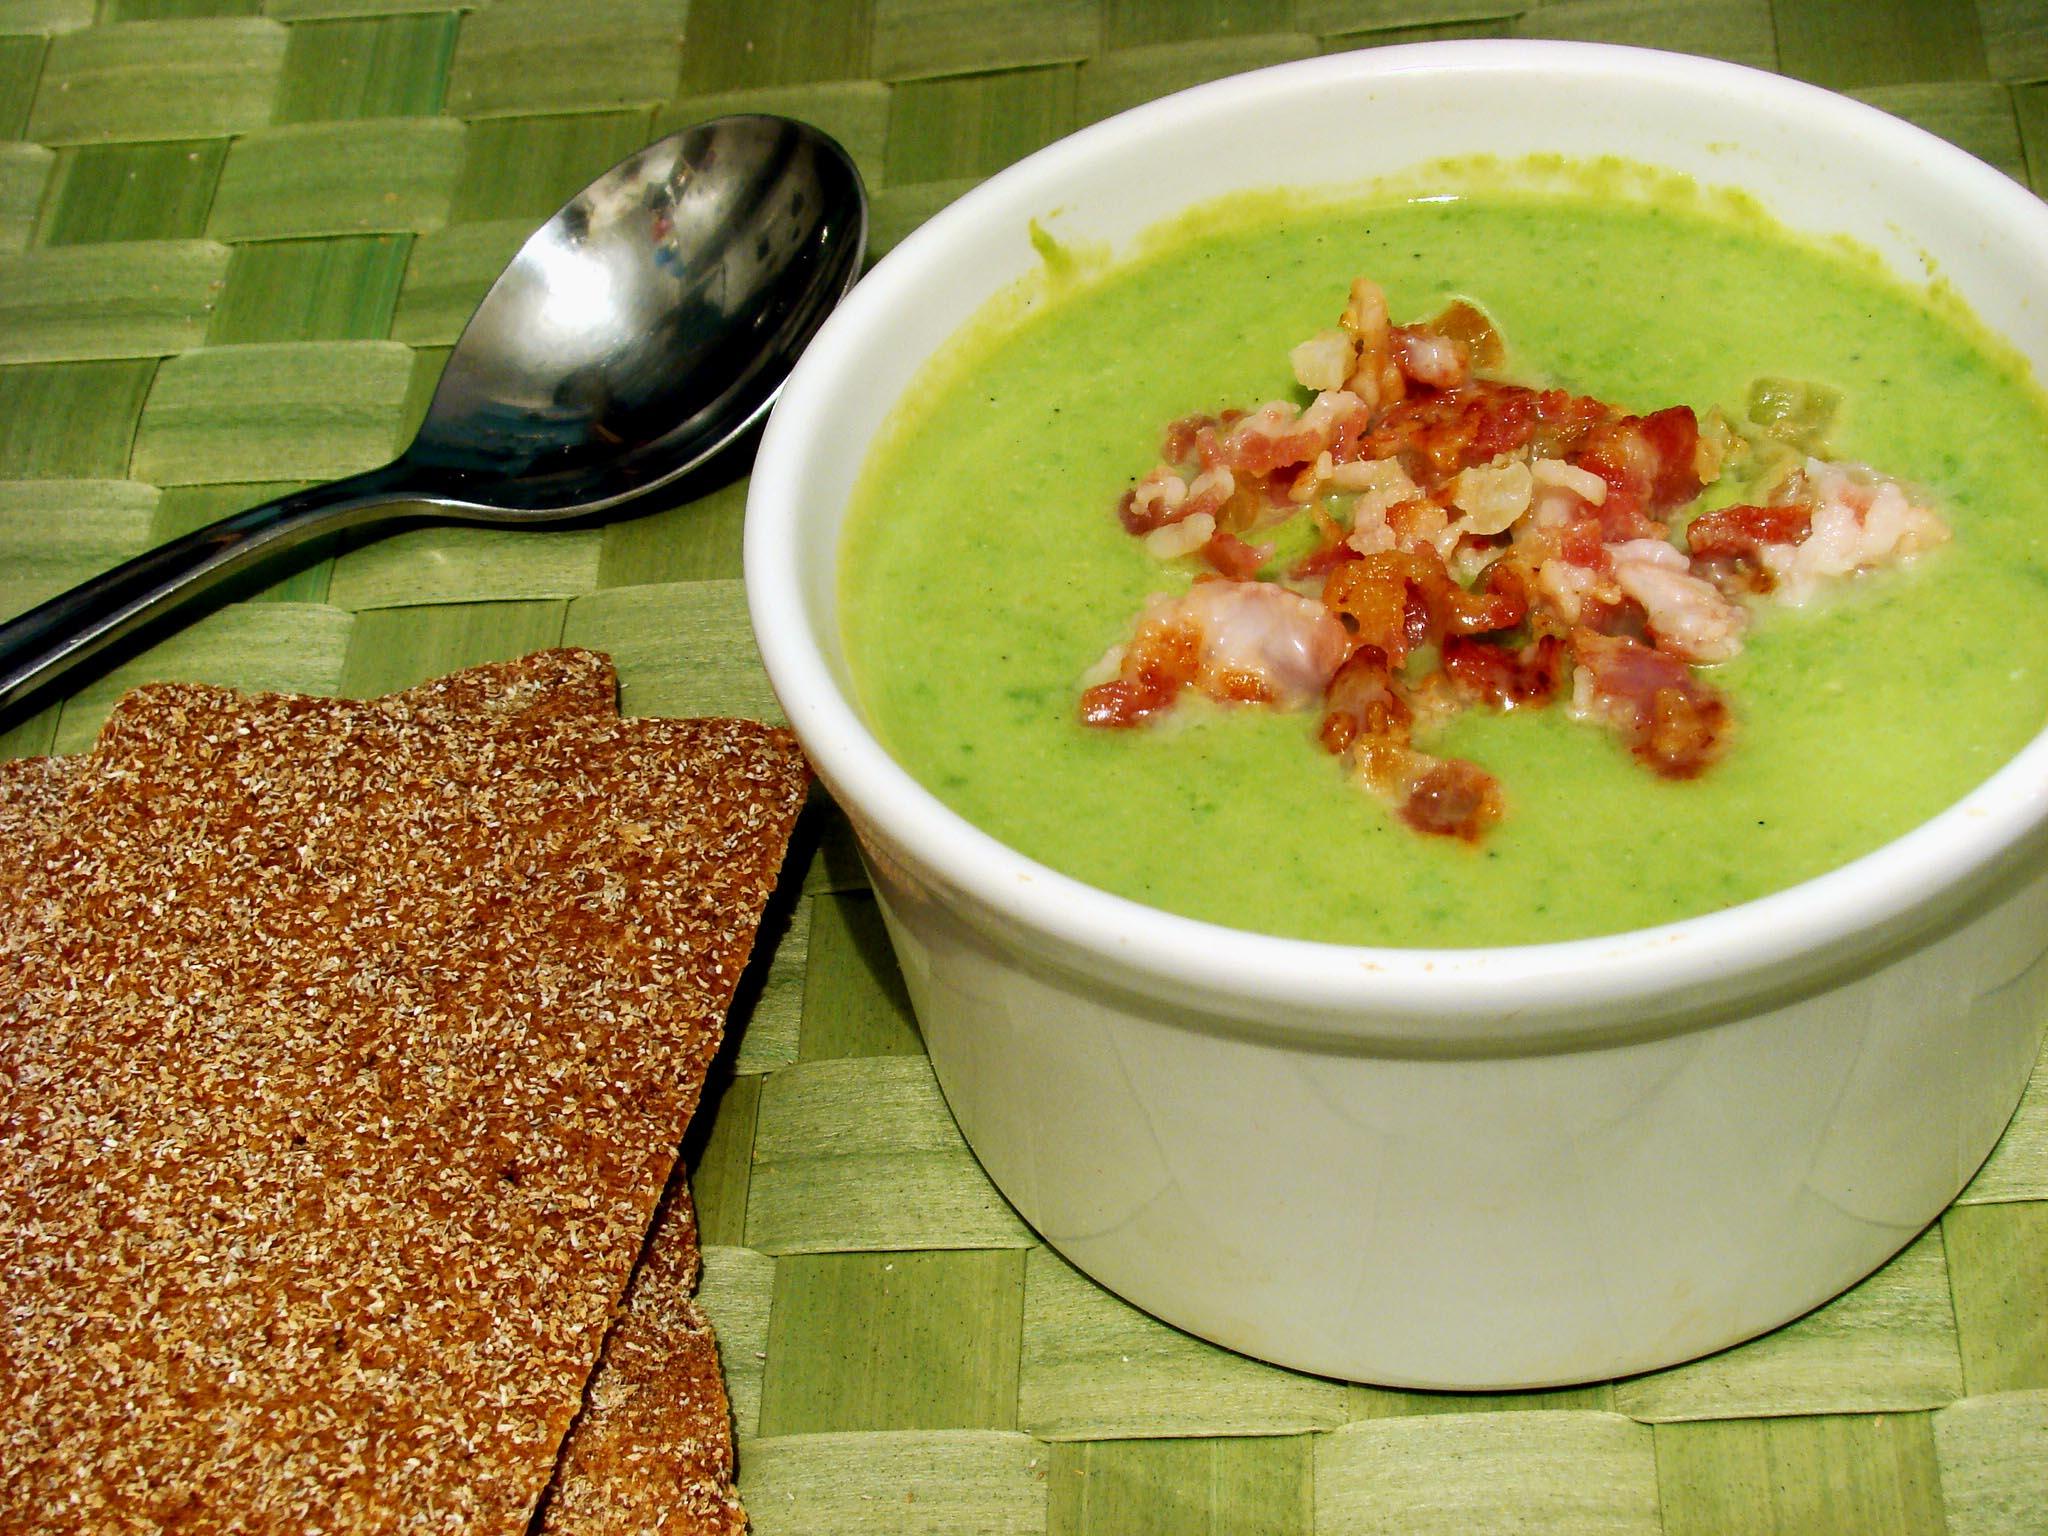 гороховой суп рецепт для мультиварки полярис